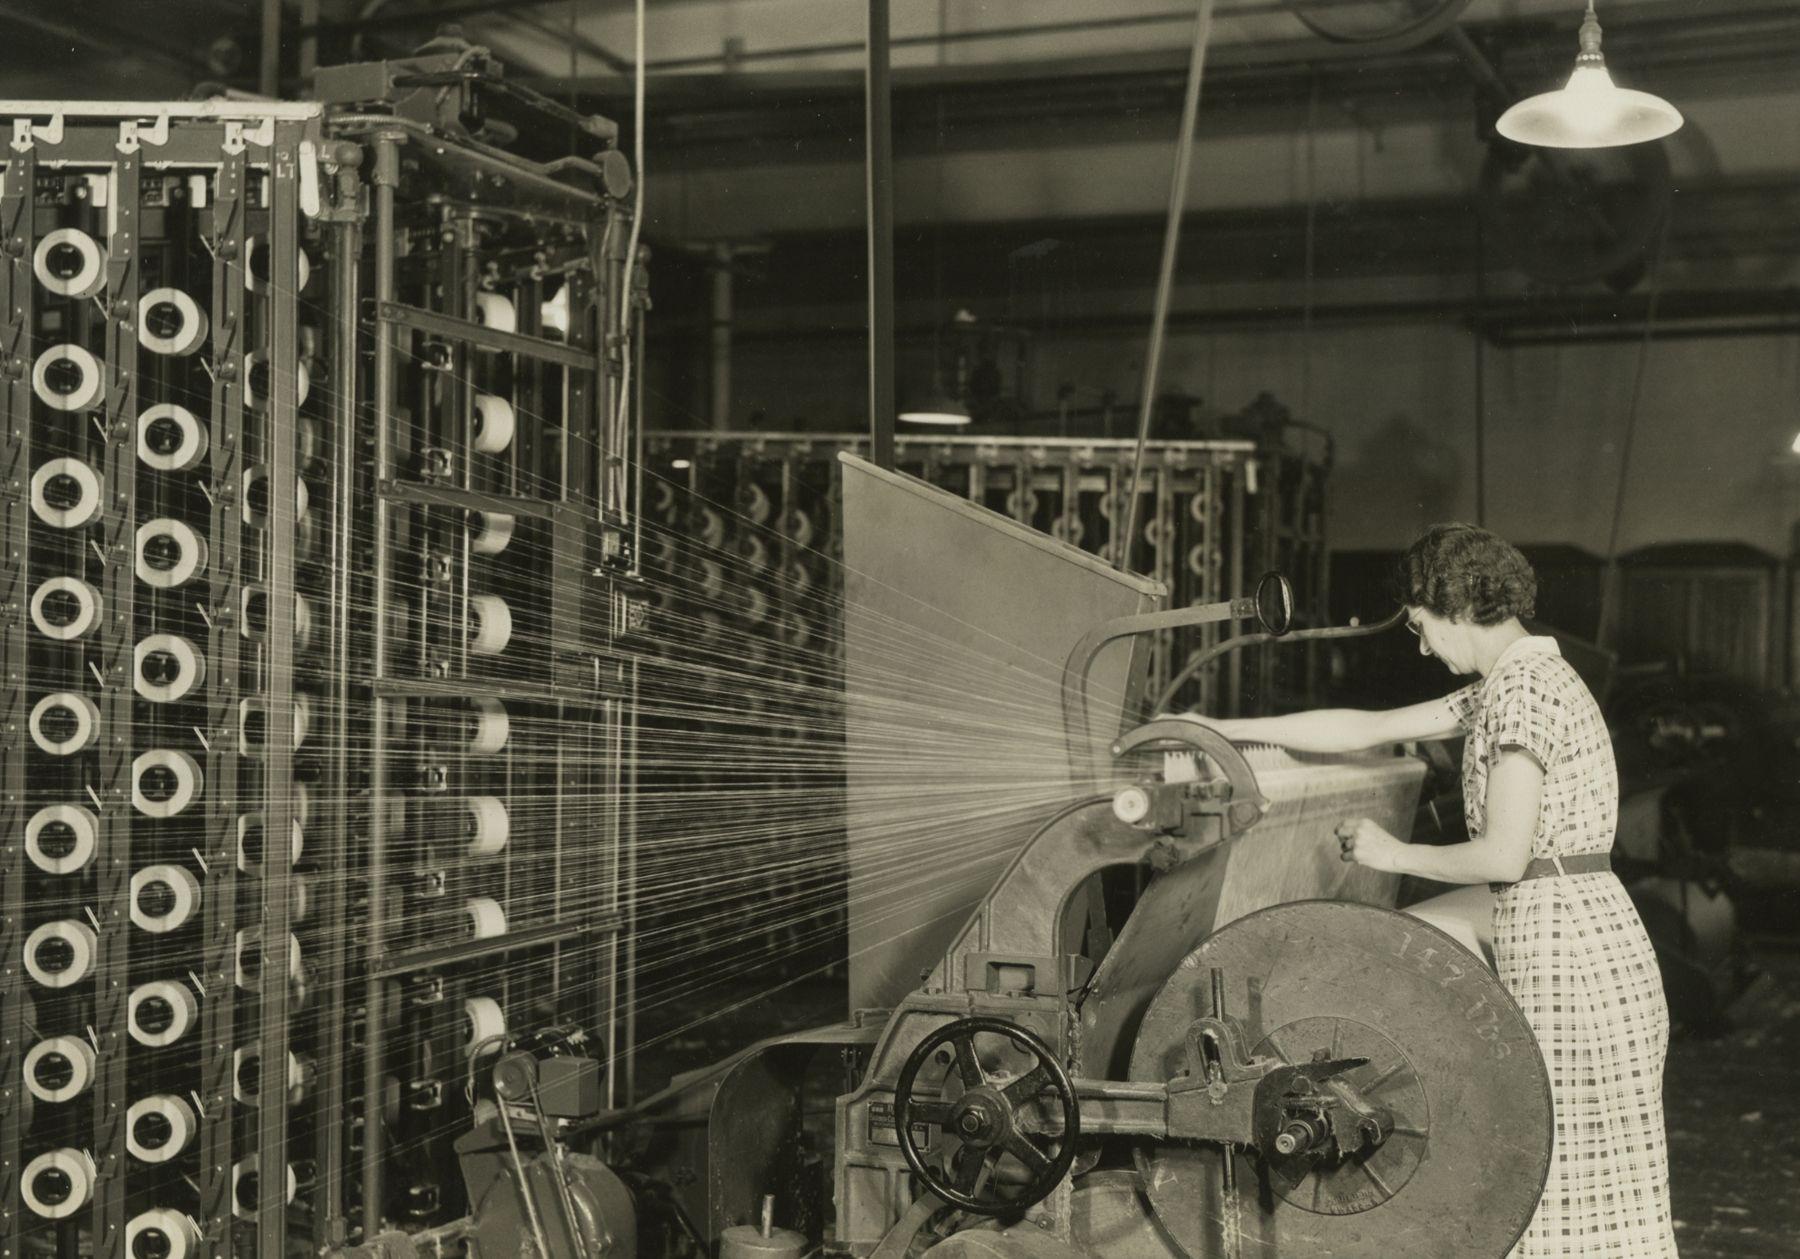 Barber-Colman High Speed Warper, Pacific Mills, Manchester, New Hampshire, April 1937  Gelatin silver print; printed c.1937